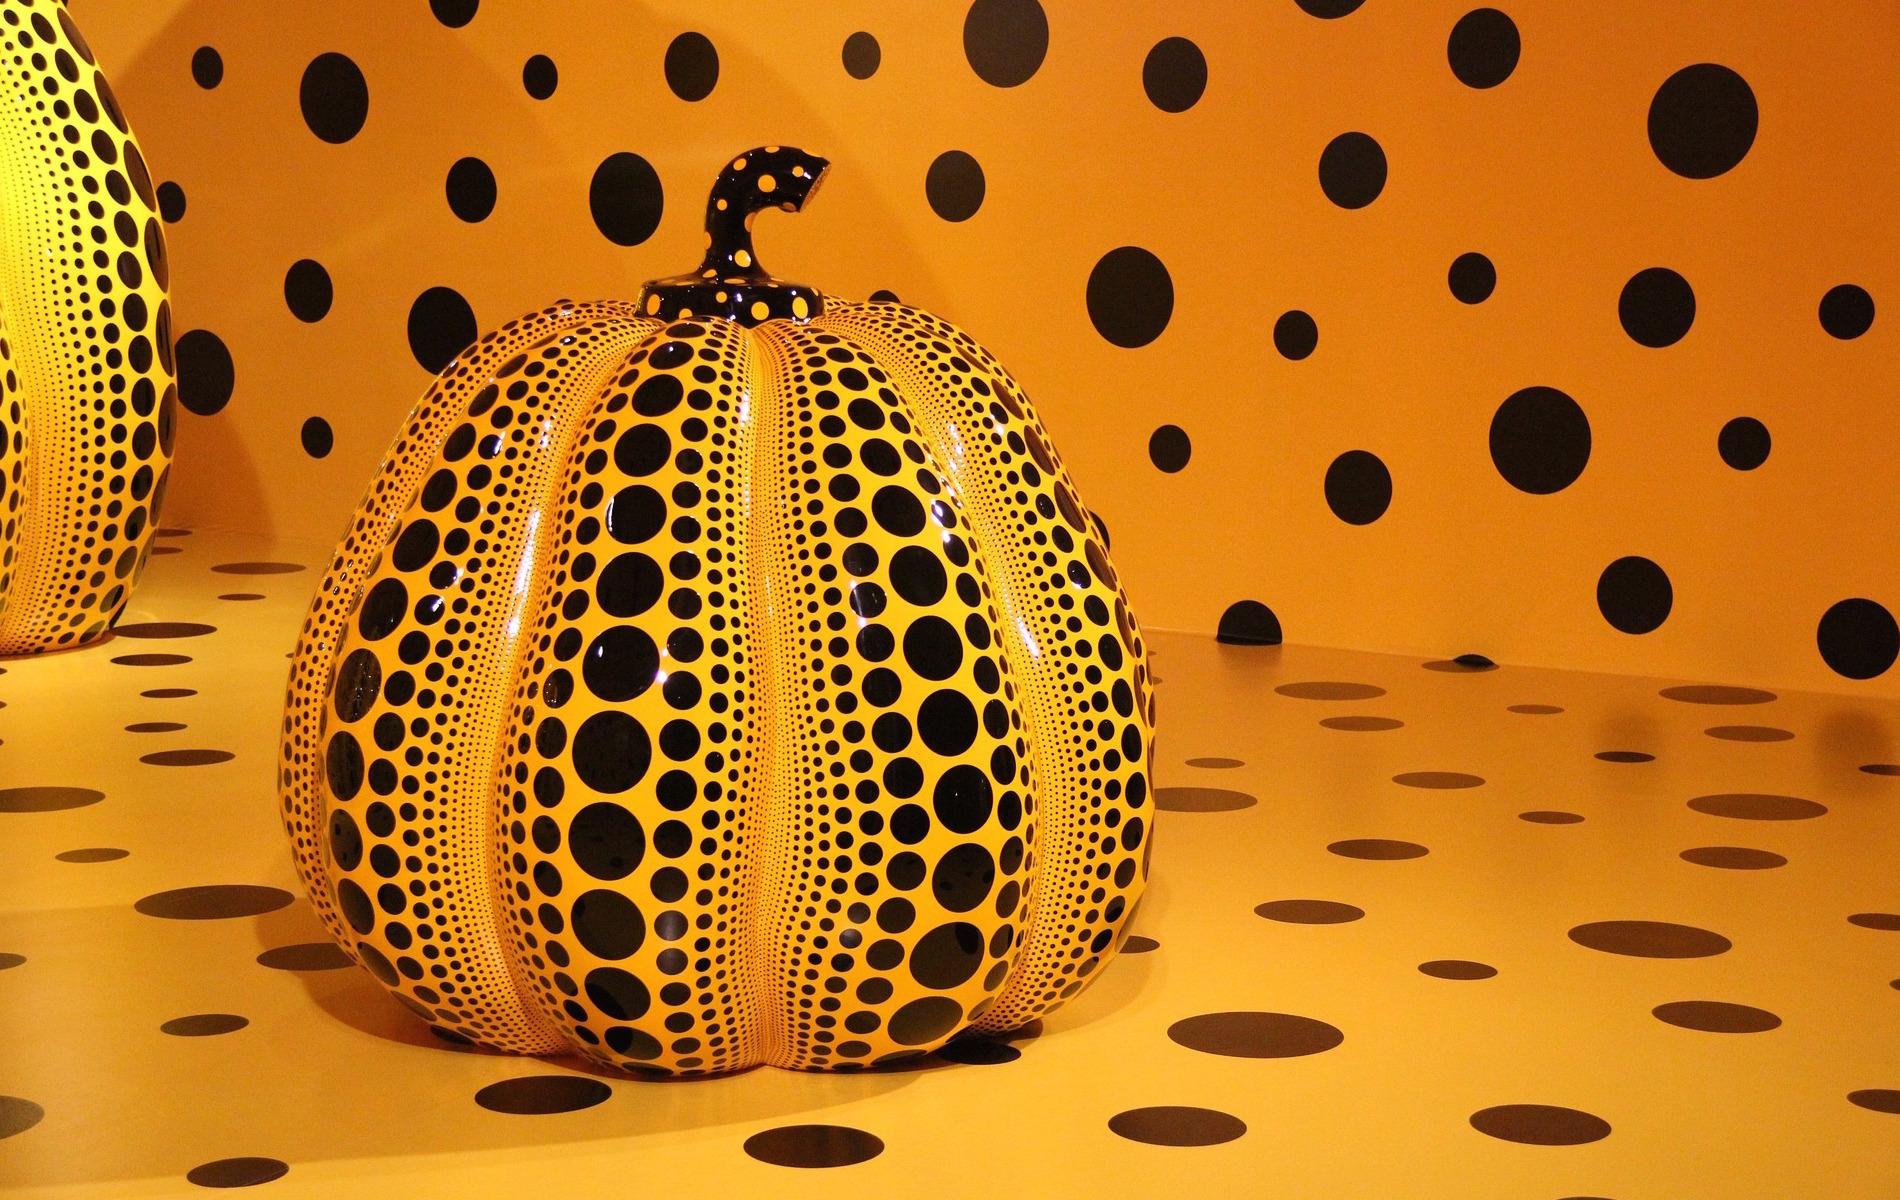 Orange pumpkin sculpture with black polka dots on same orange background with black dots